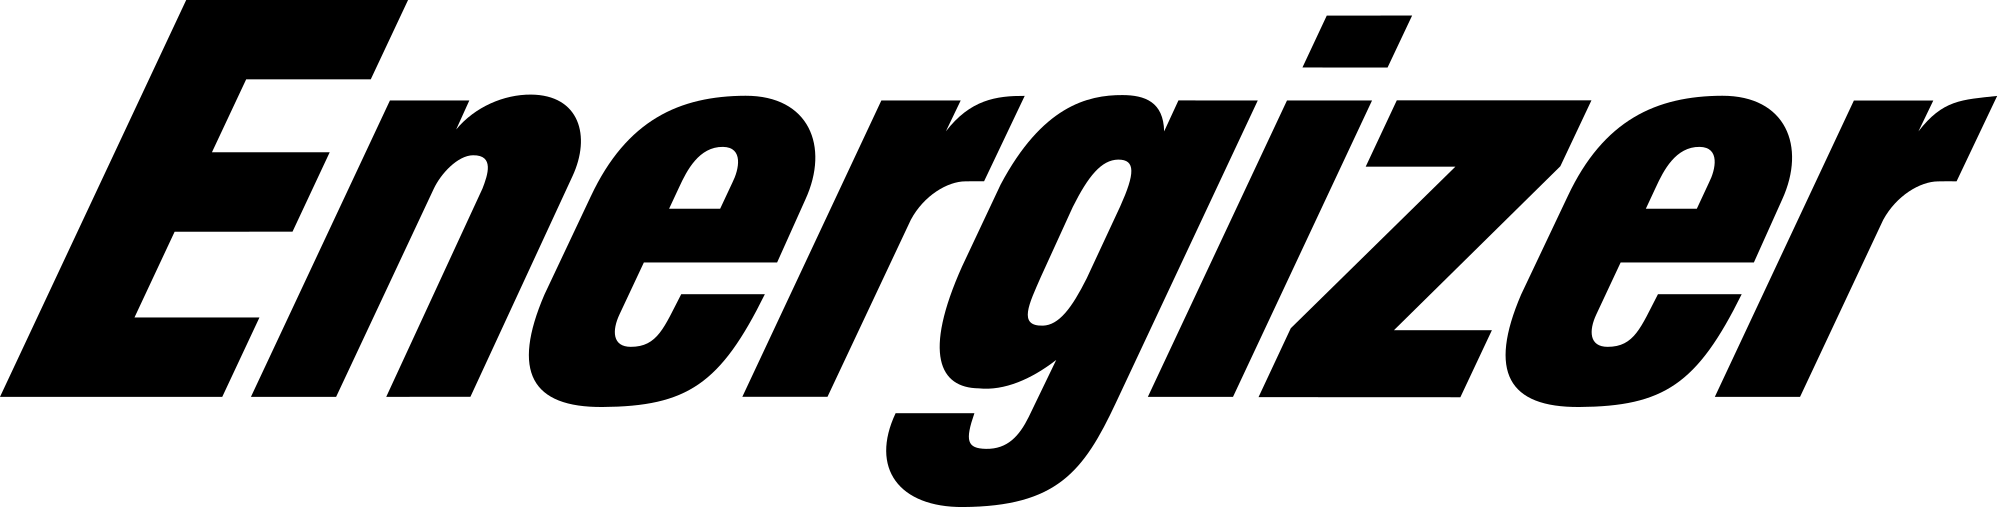 Energizer PNG